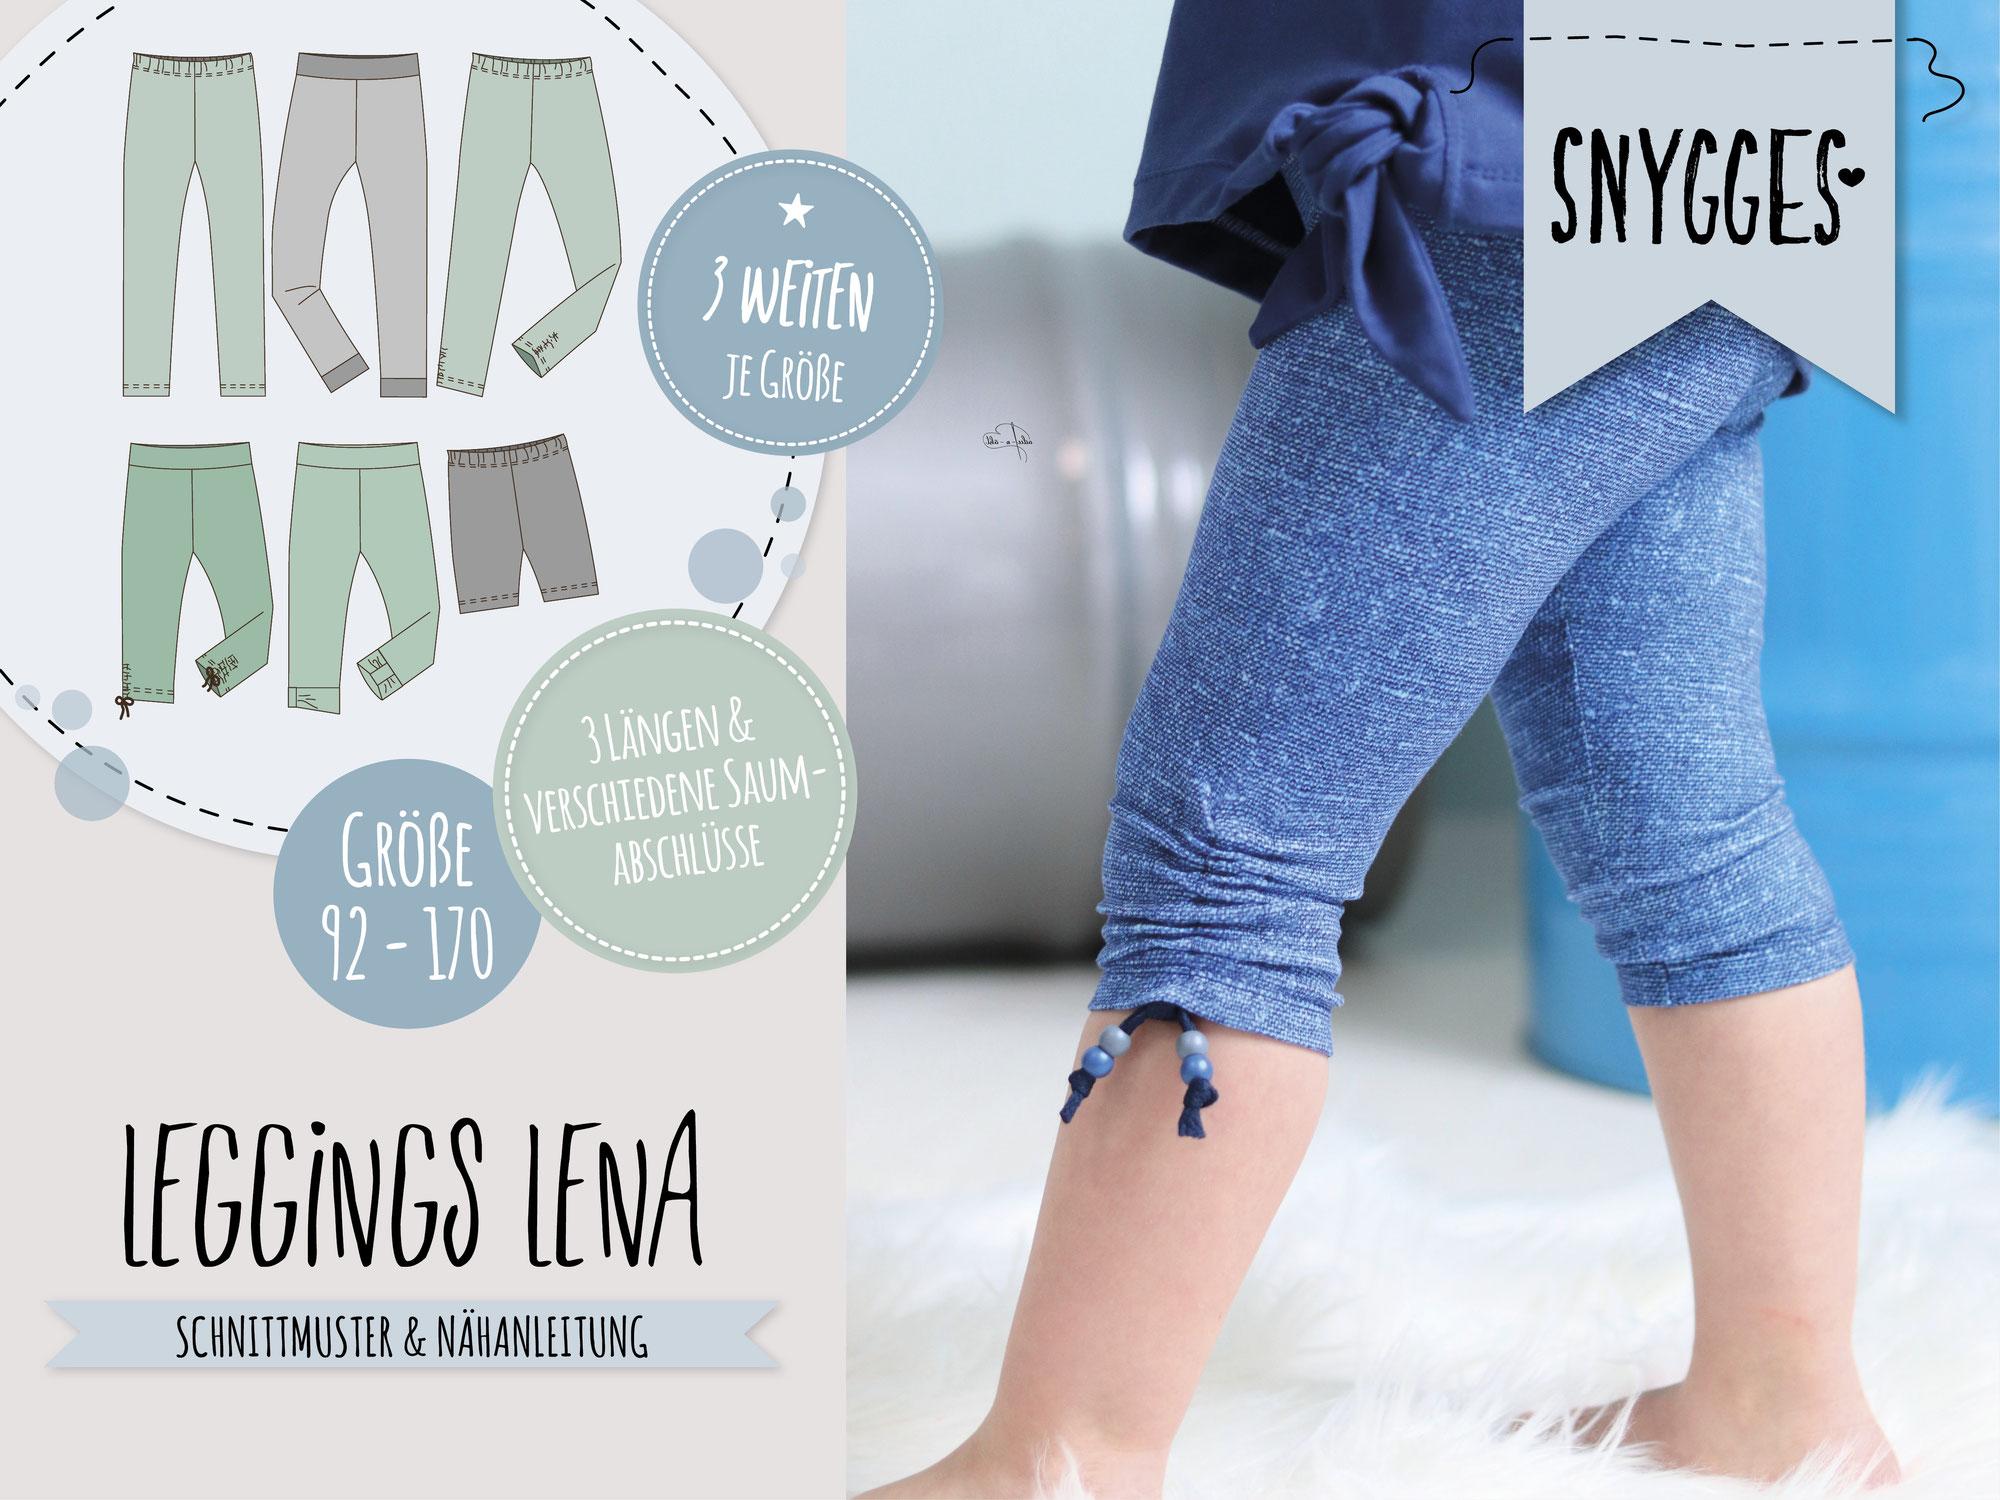 Leggings LENA ist da!